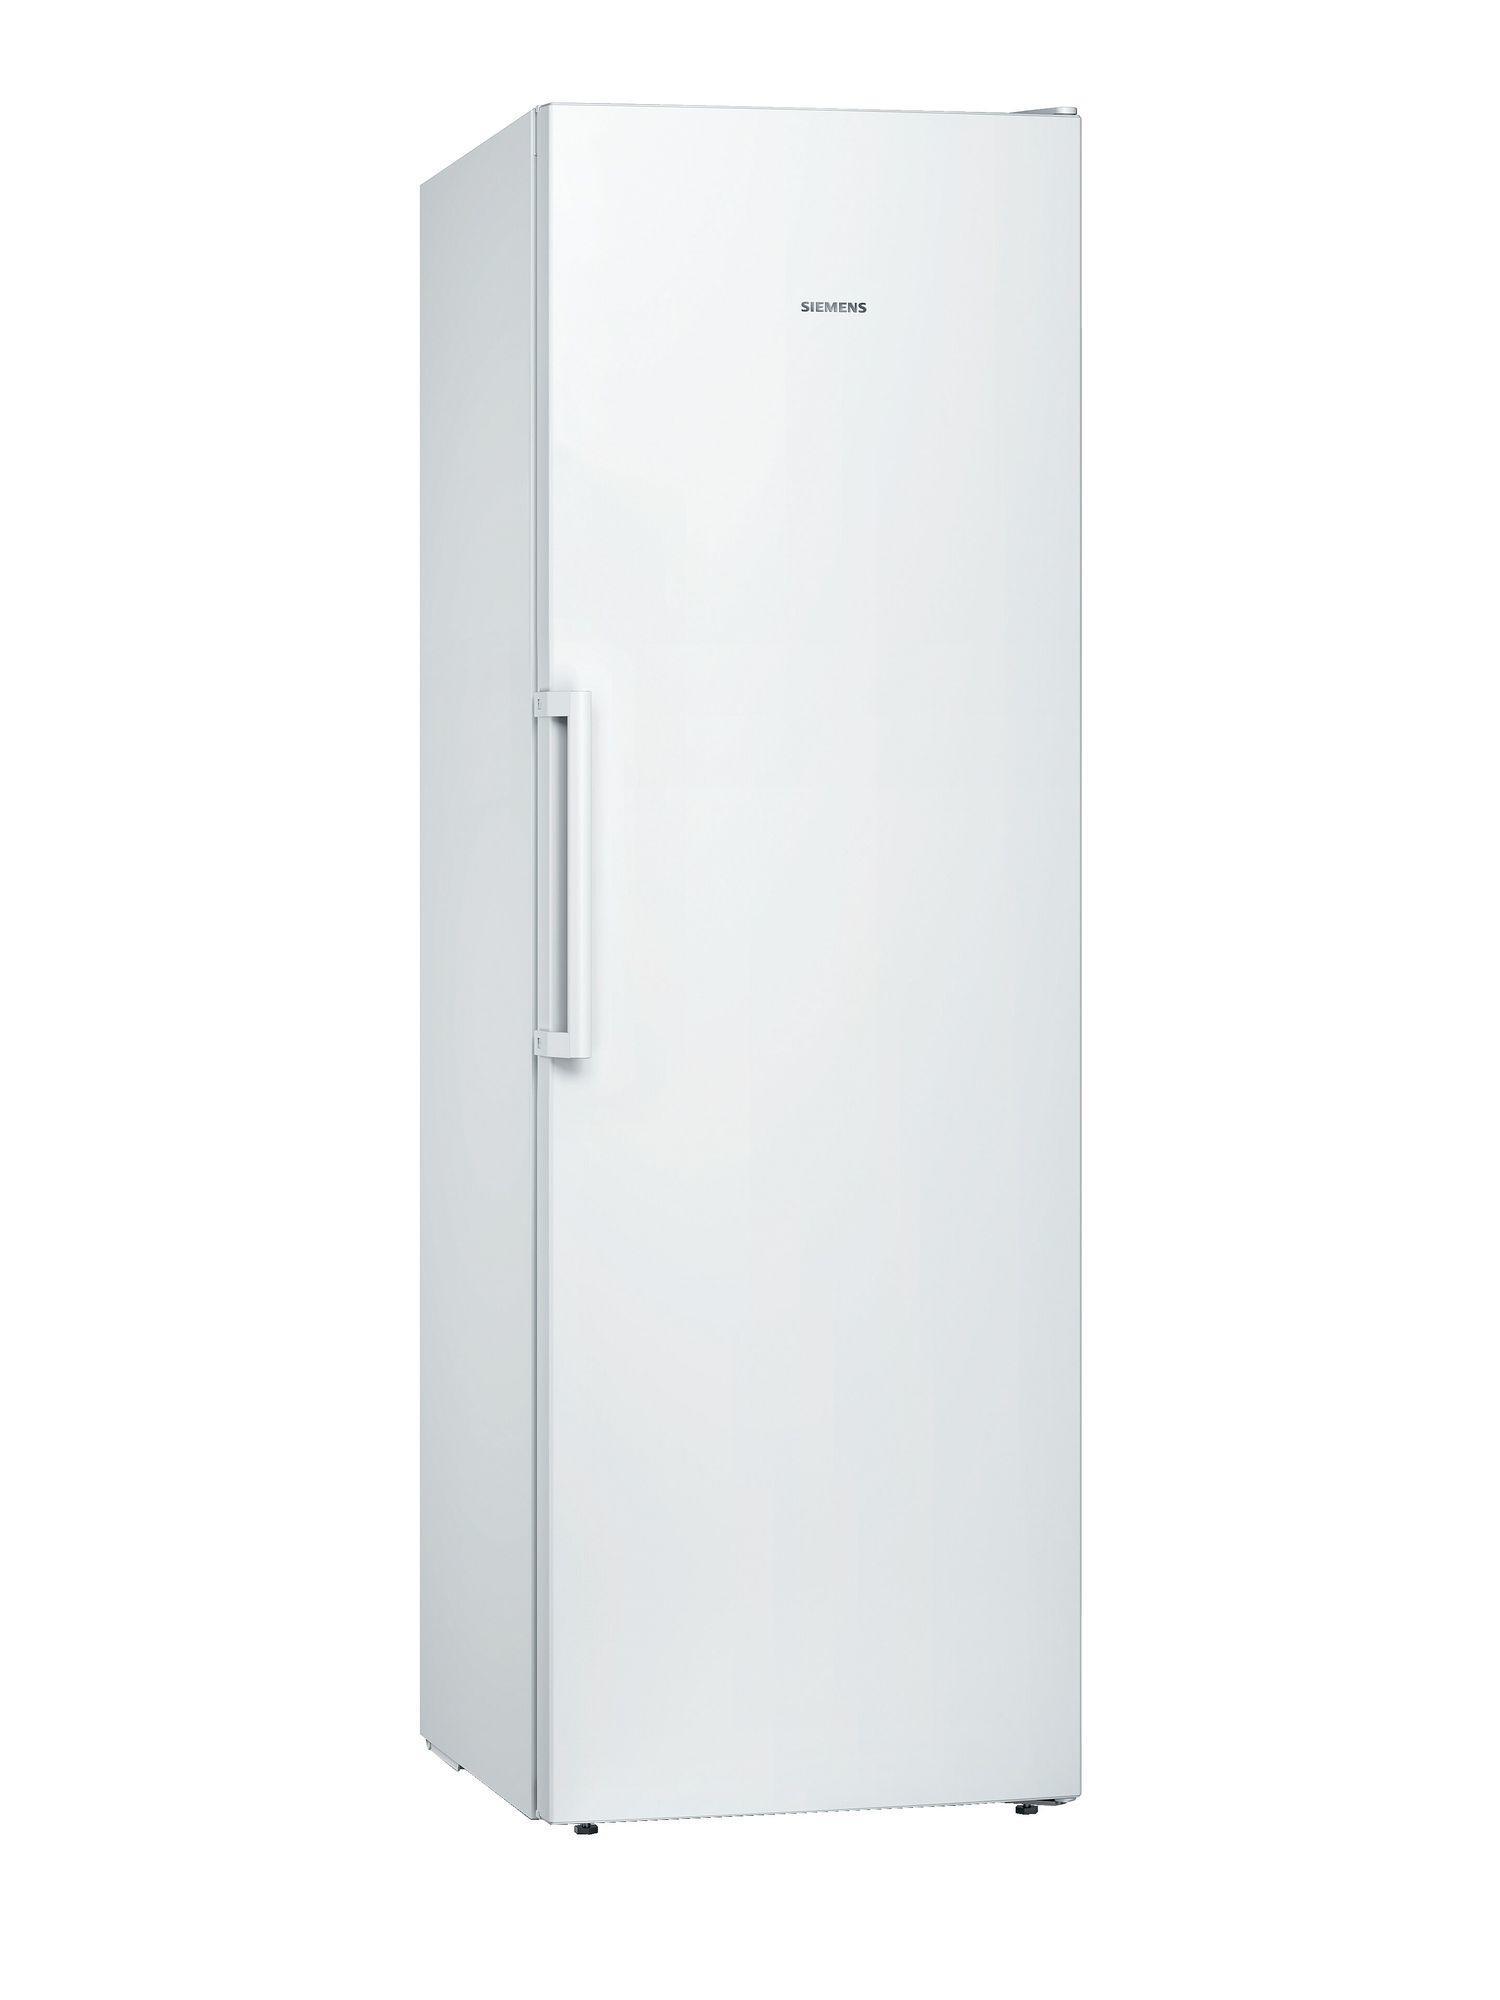 Image of iQ300 GS36NVWFV 242 Litre 60cm Single Door Freezer | White